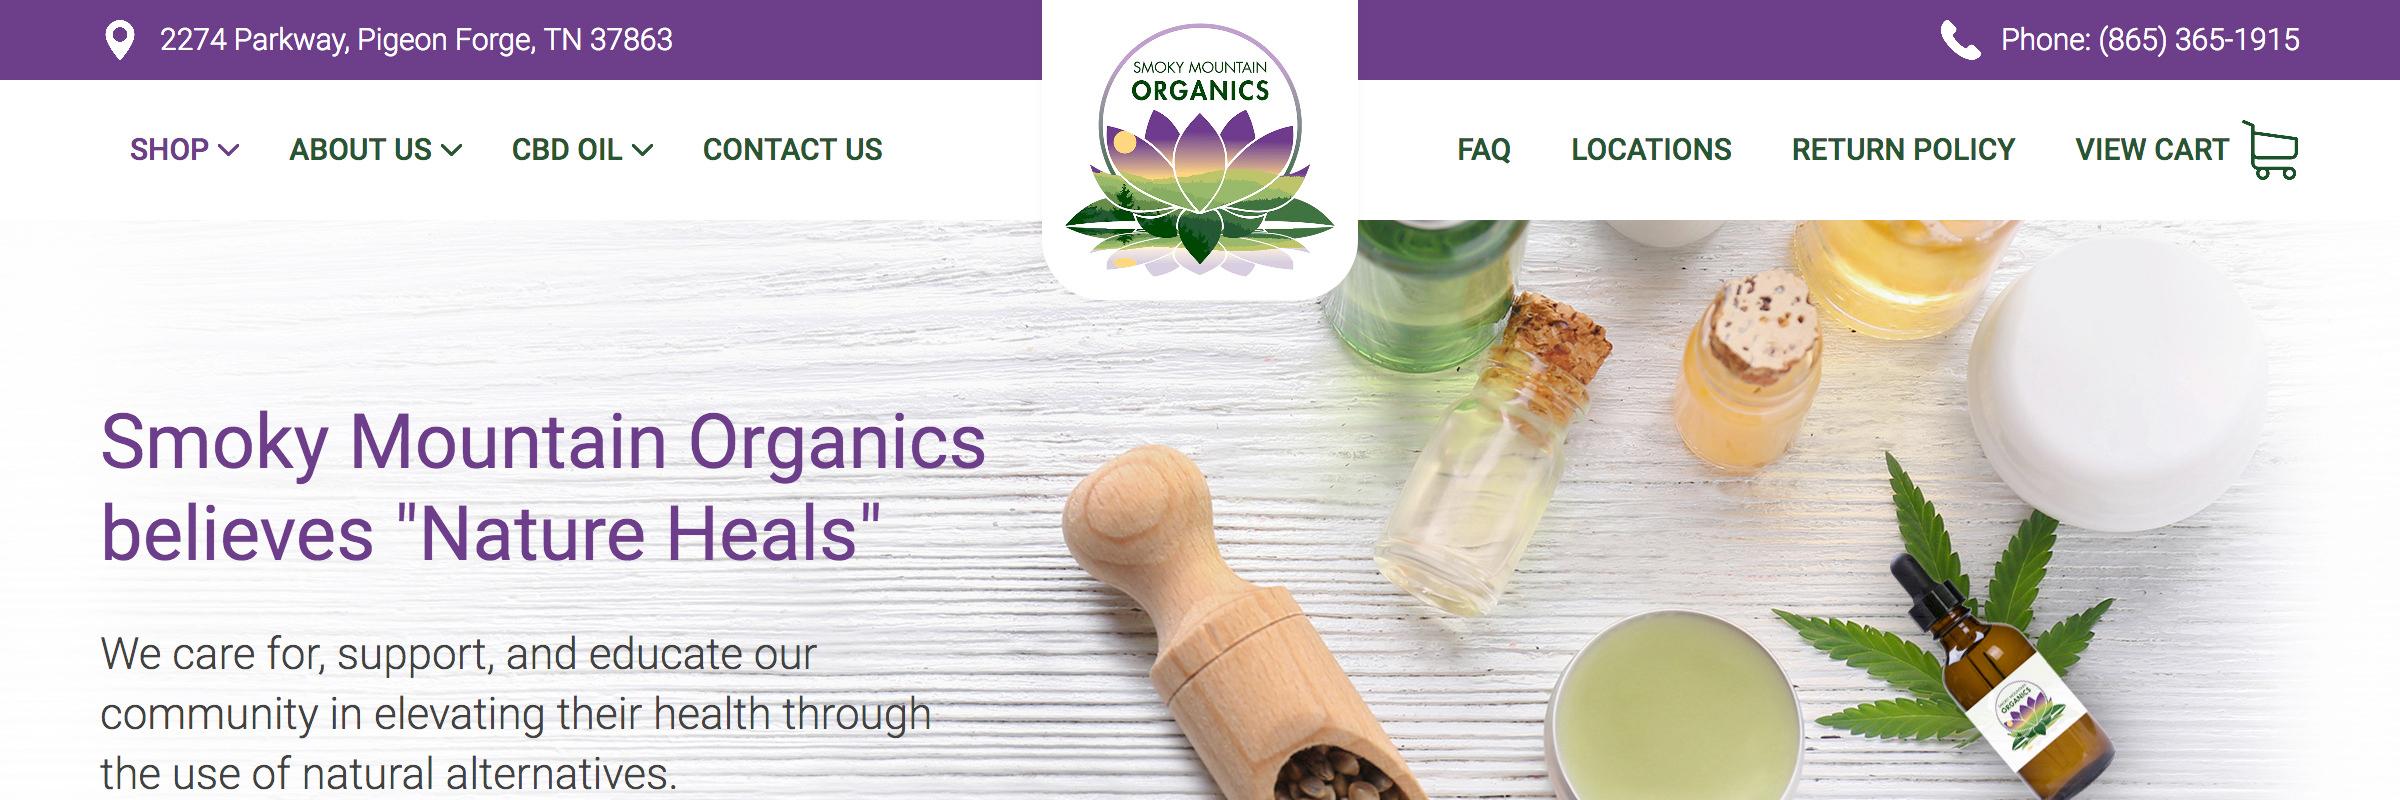 Smoky Mountain Organics